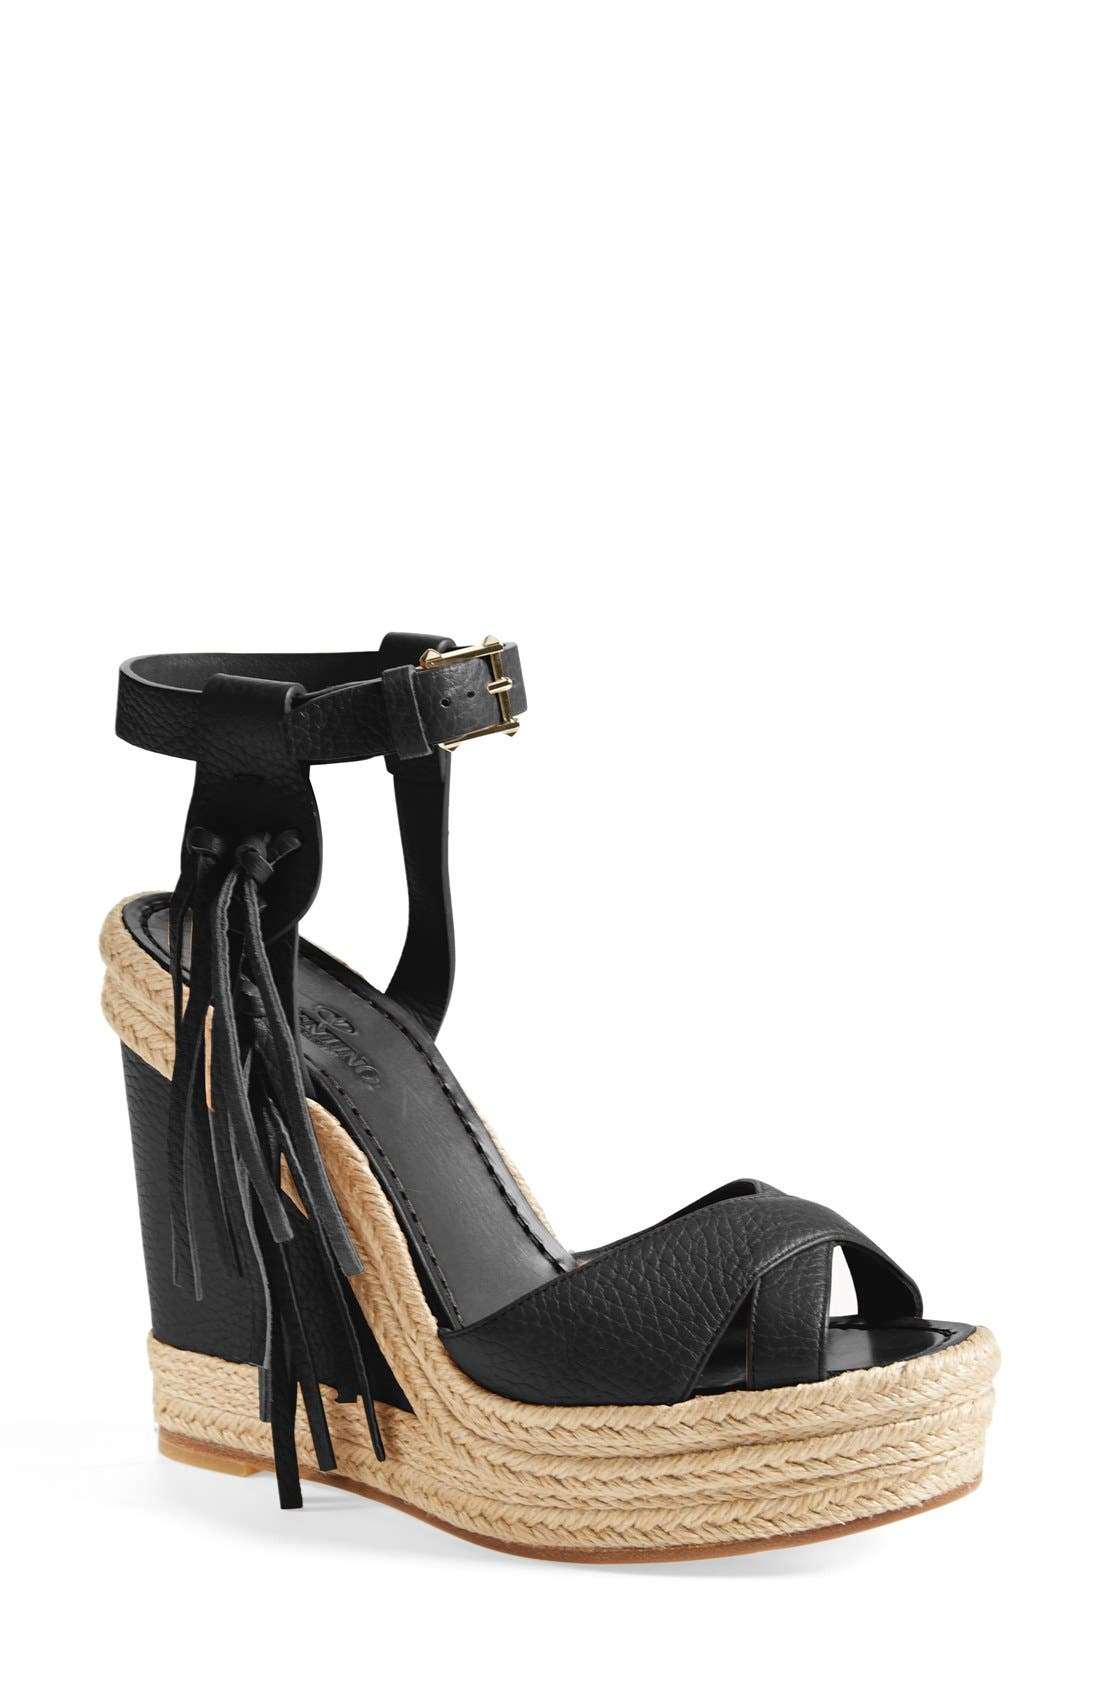 Alternate Image 1 Selected - Valentino 'Rockee' Fringe Wedge Sandal (Women)